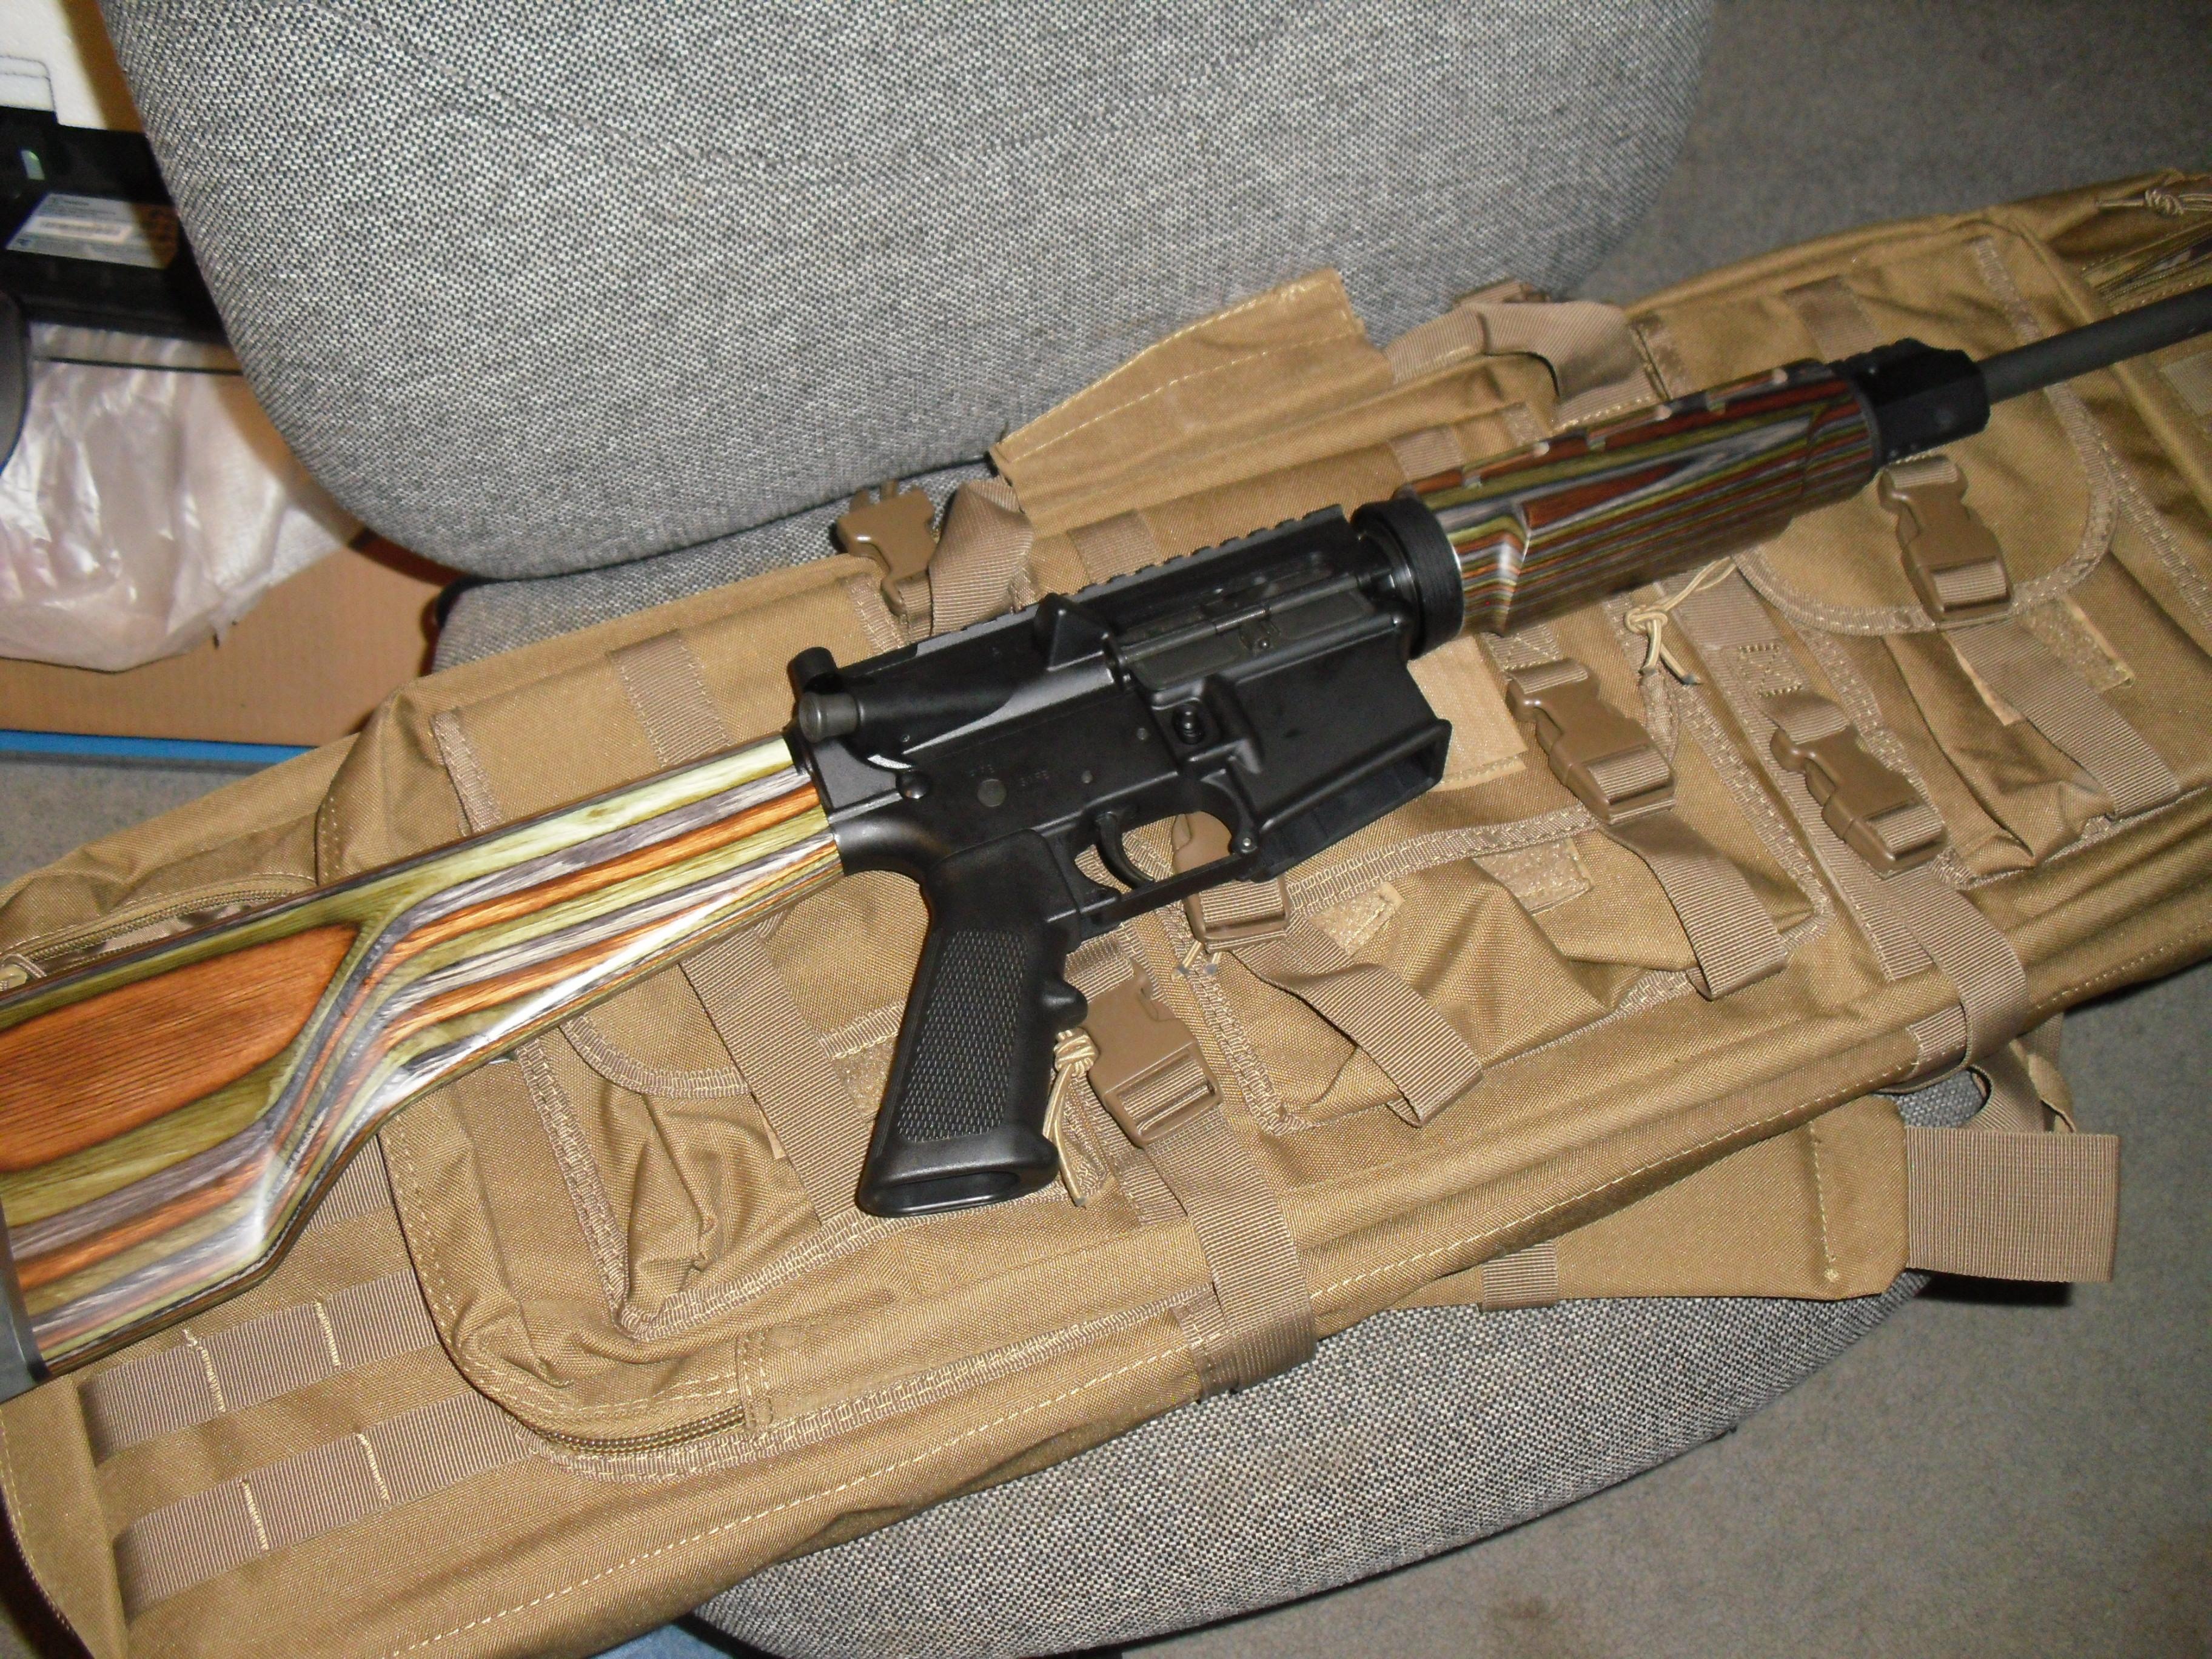 boyds laminate ar stocks forearms gun and game the friendliest